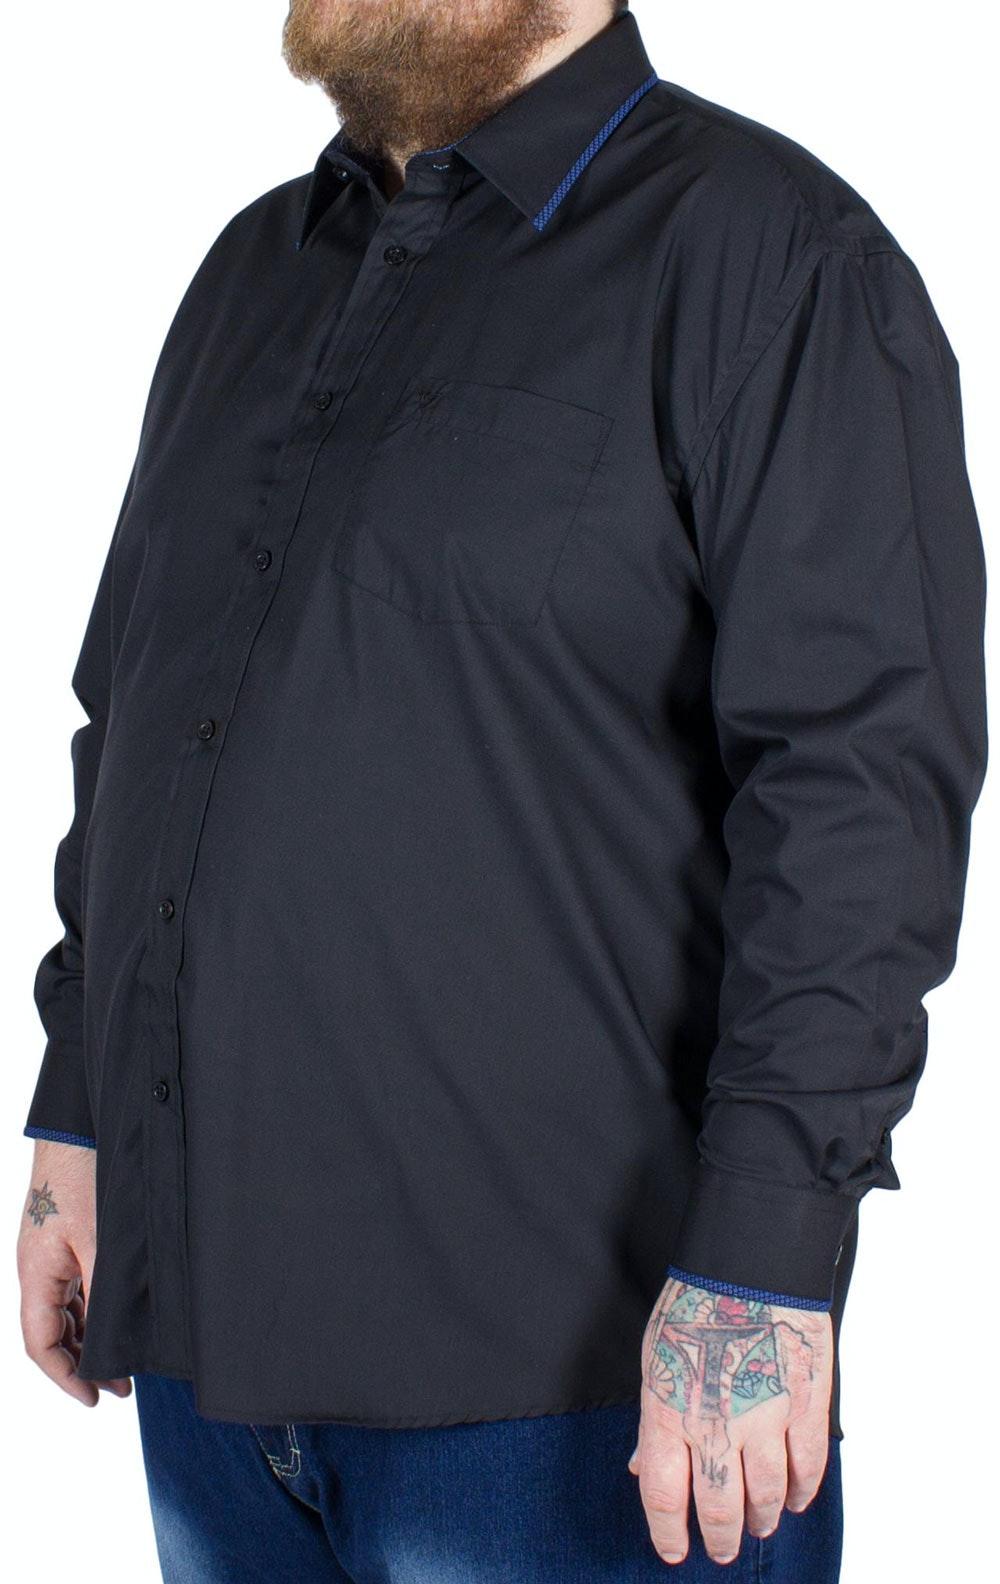 Cotton Valley Long Sleeve Shirt Black